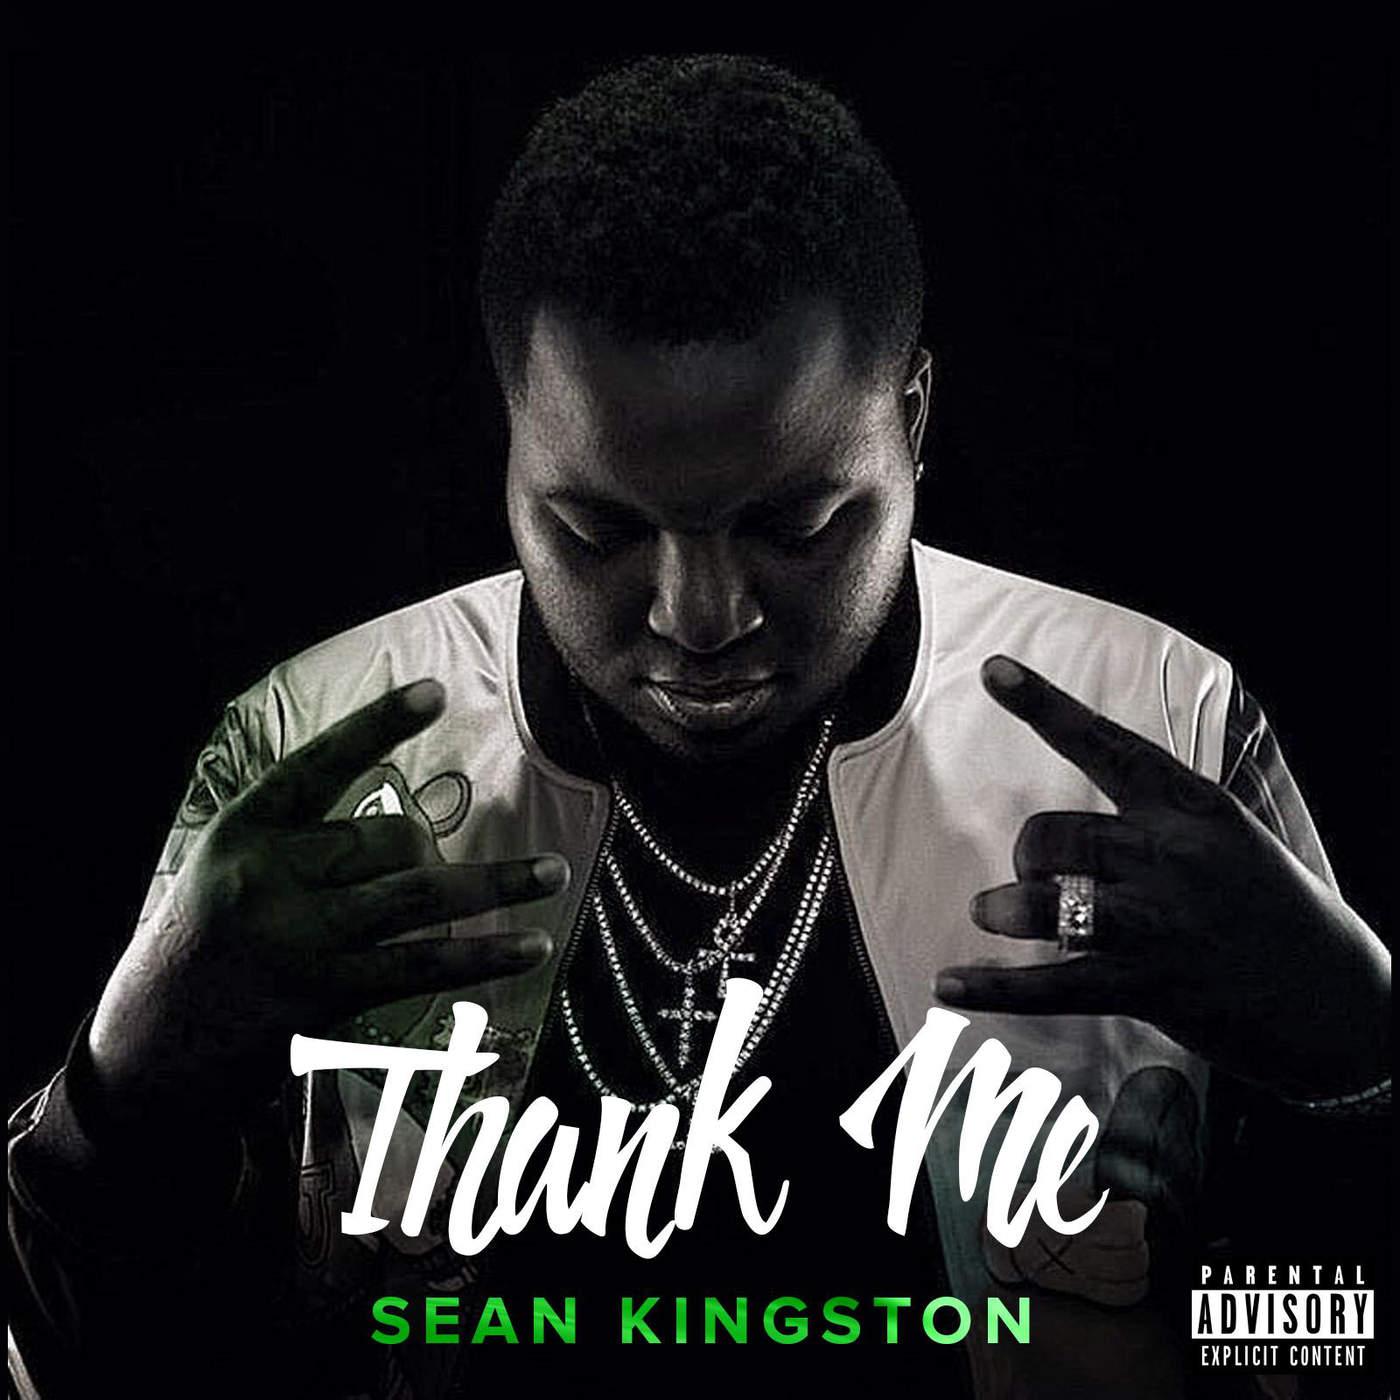 Sean Kingston - Thank Me - Single Cover